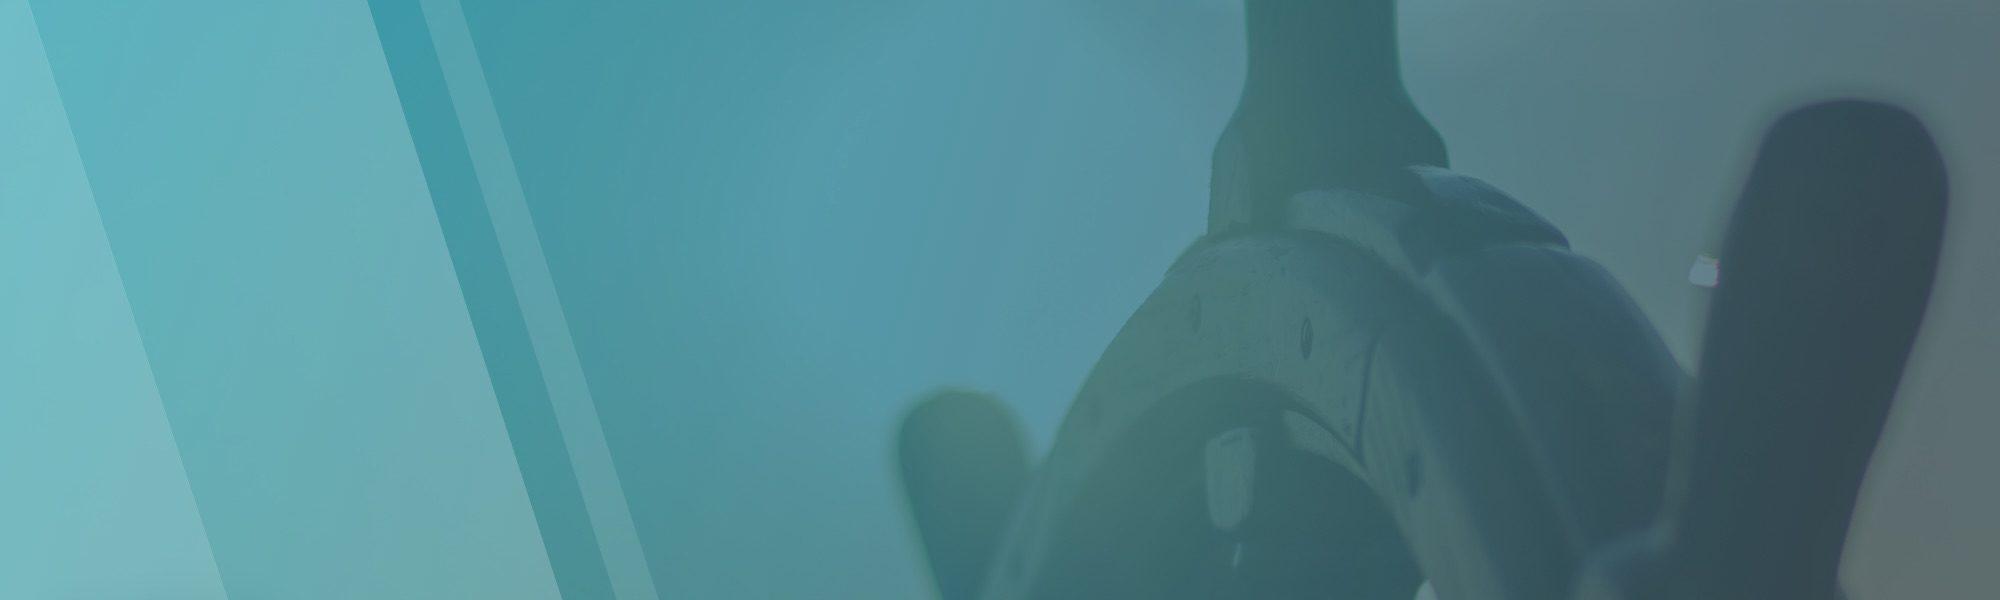 USCG Application Video Series Image